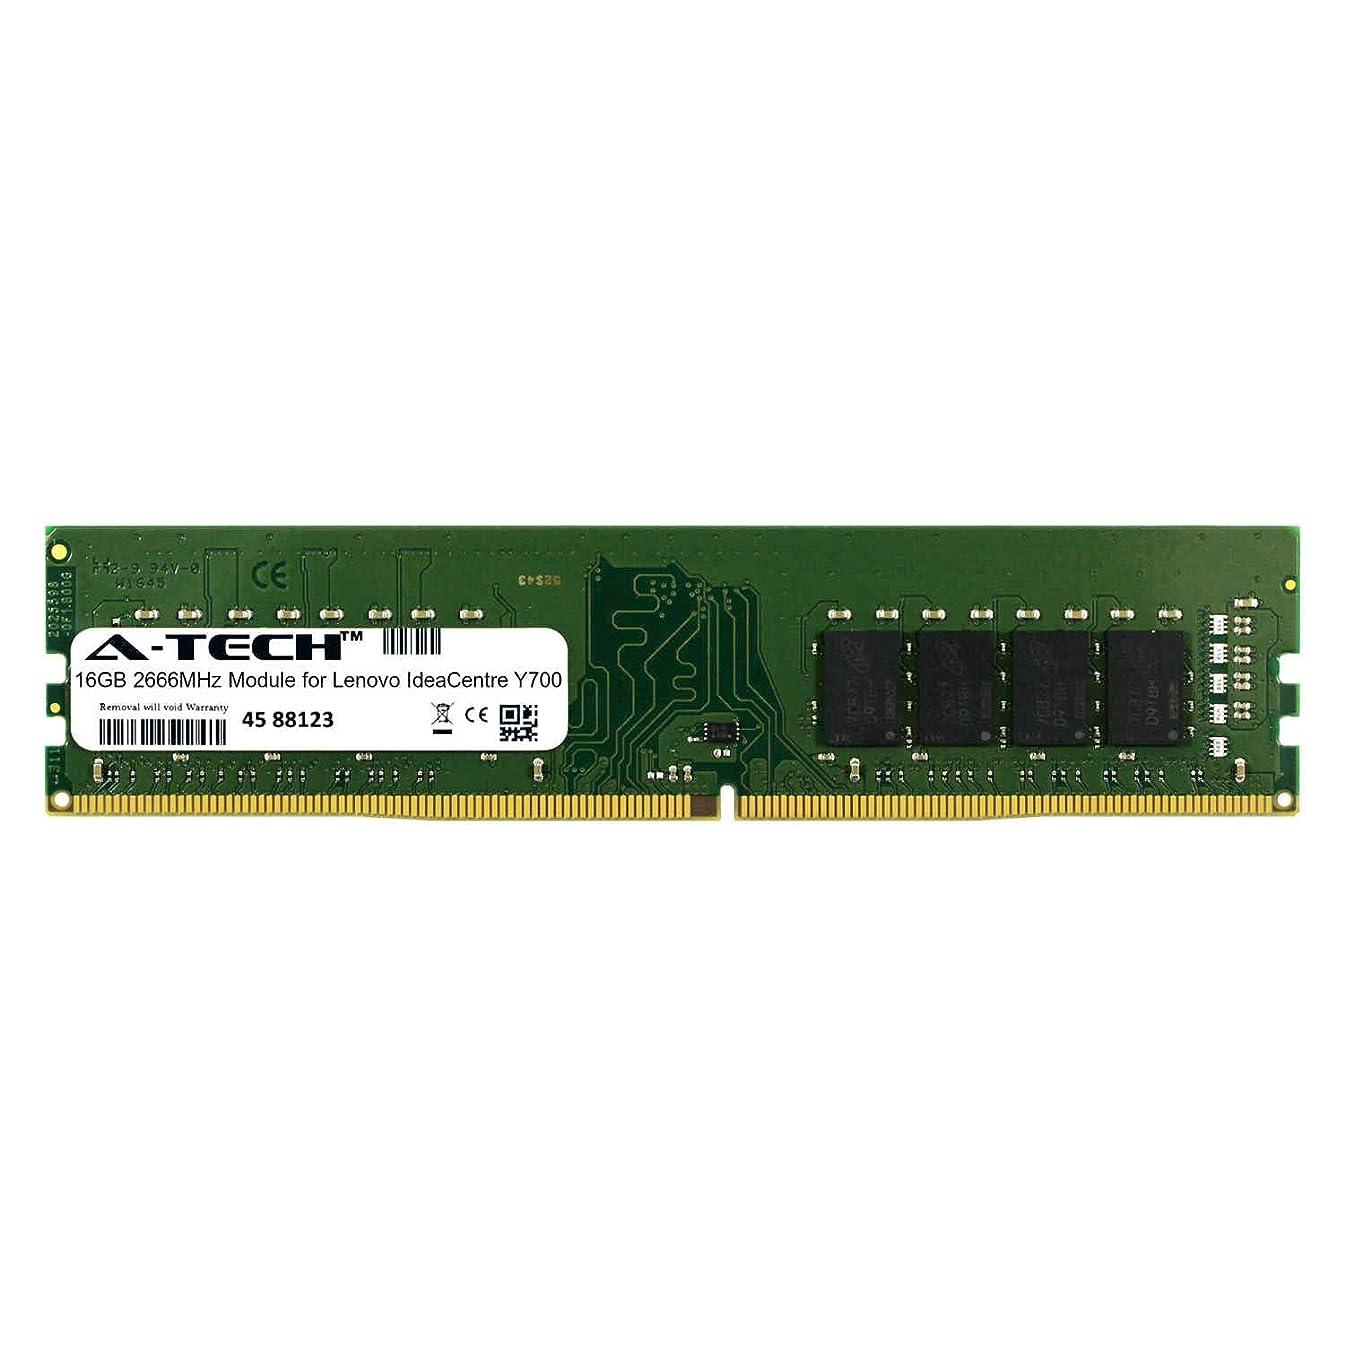 A-Tech 16GB Module for Lenovo IdeaCentre Y700 Desktop & Workstation Motherboard Compatible DDR4 2666Mhz Memory Ram (ATMS276839A25823X1)